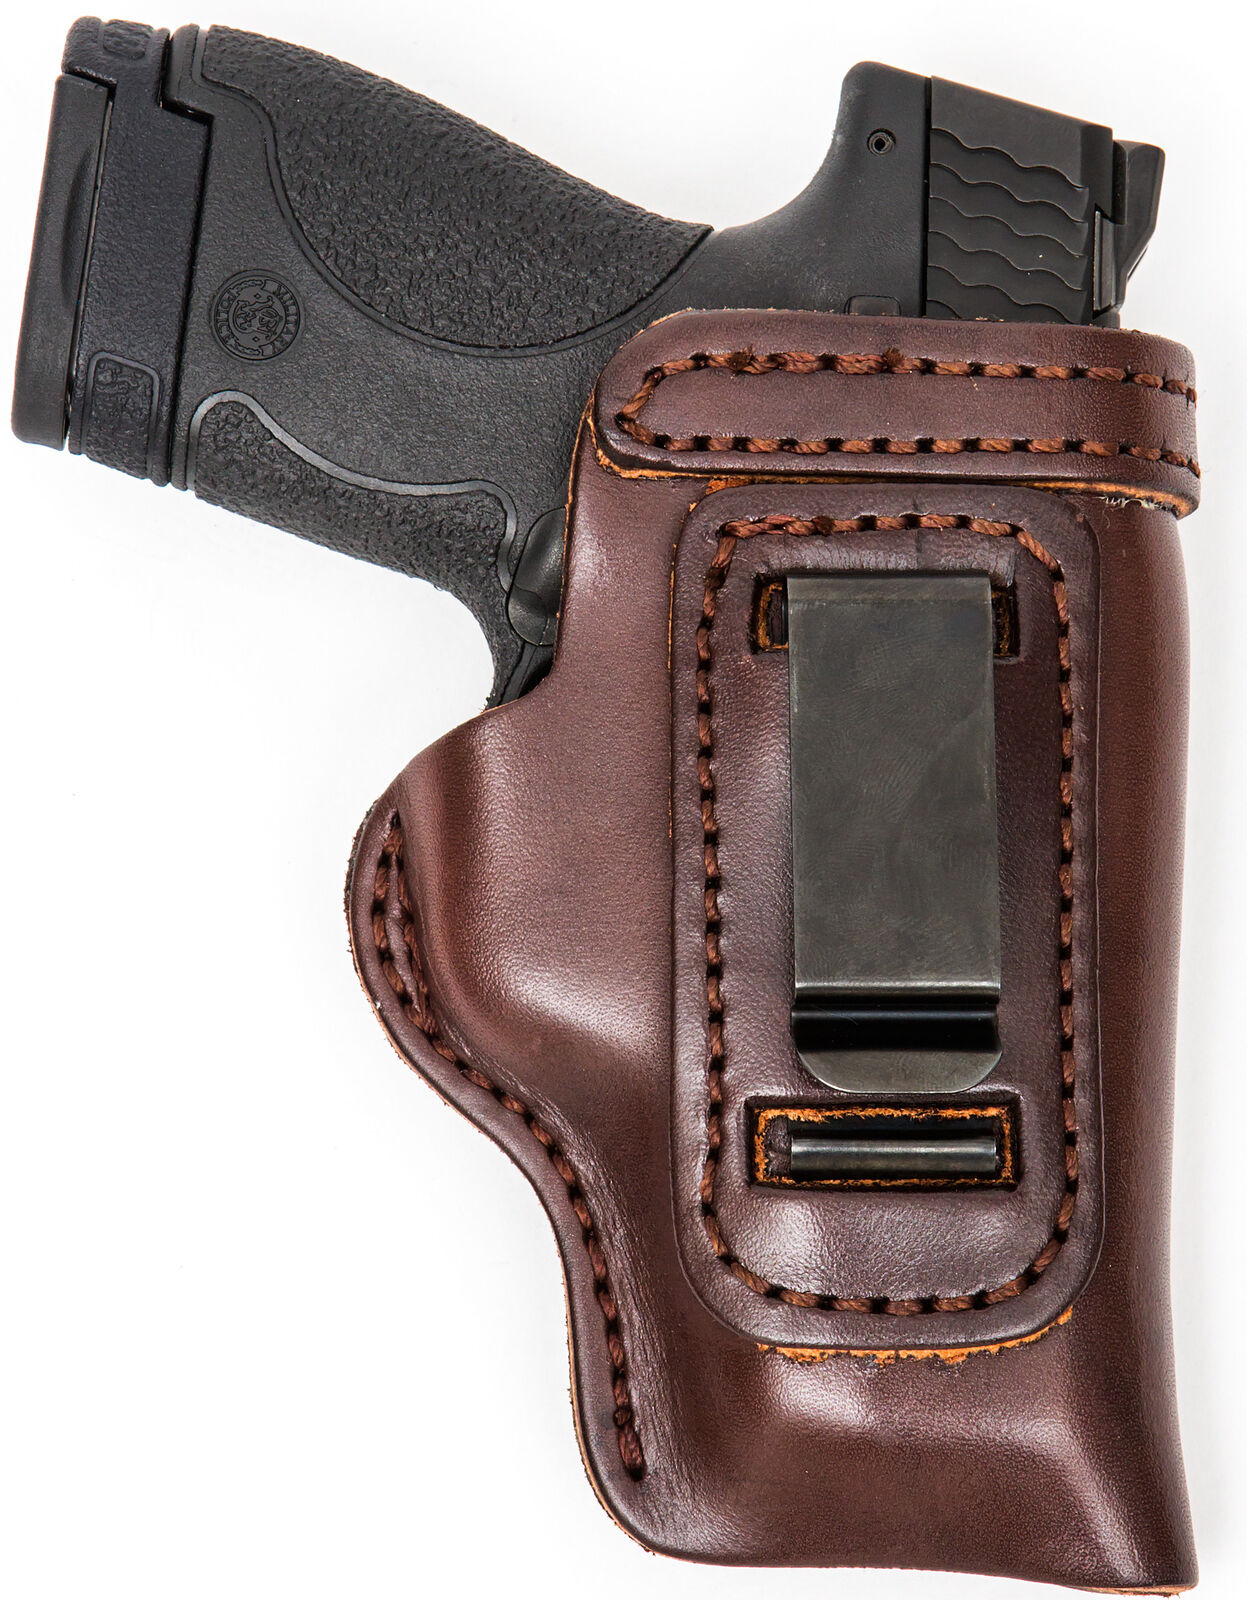 HD Concealed RH LH LH RH OWB IWB Leder Gun Holster For Springfield XDS 3.3 CT Laser ee0020